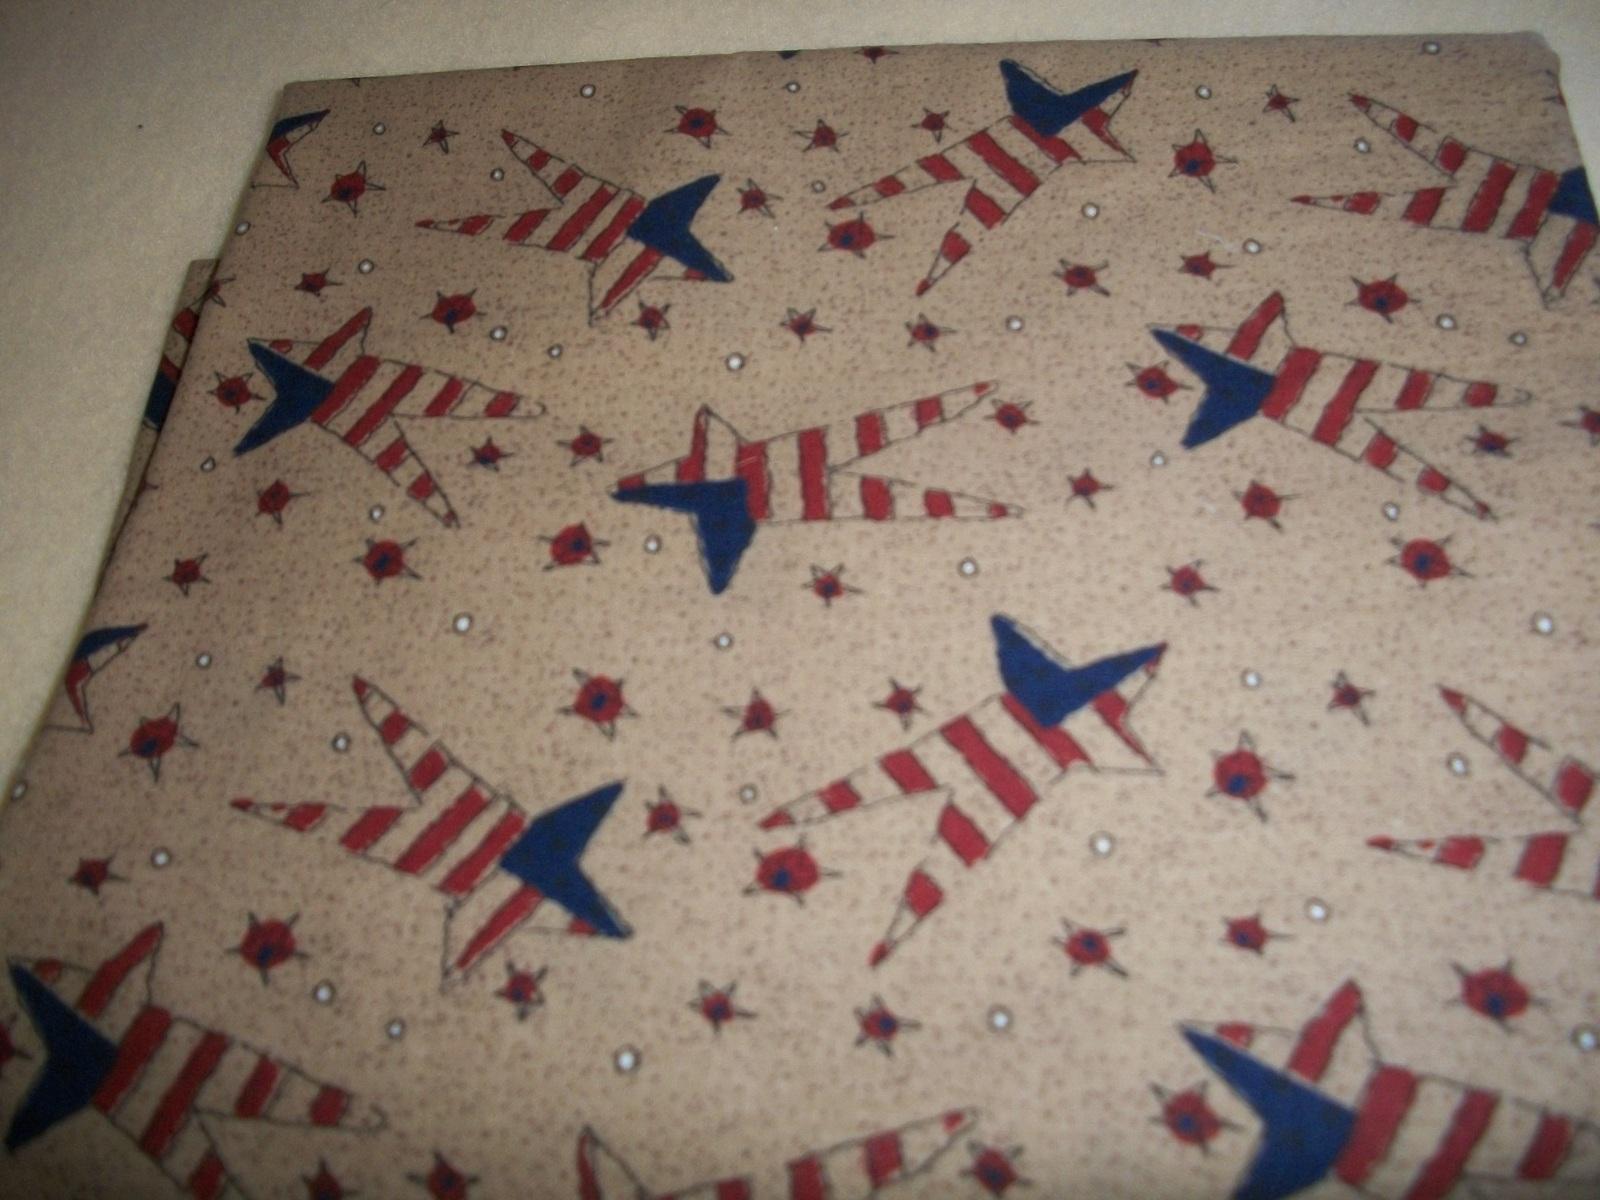 Stars & Stripes Tan Cotton Fabric